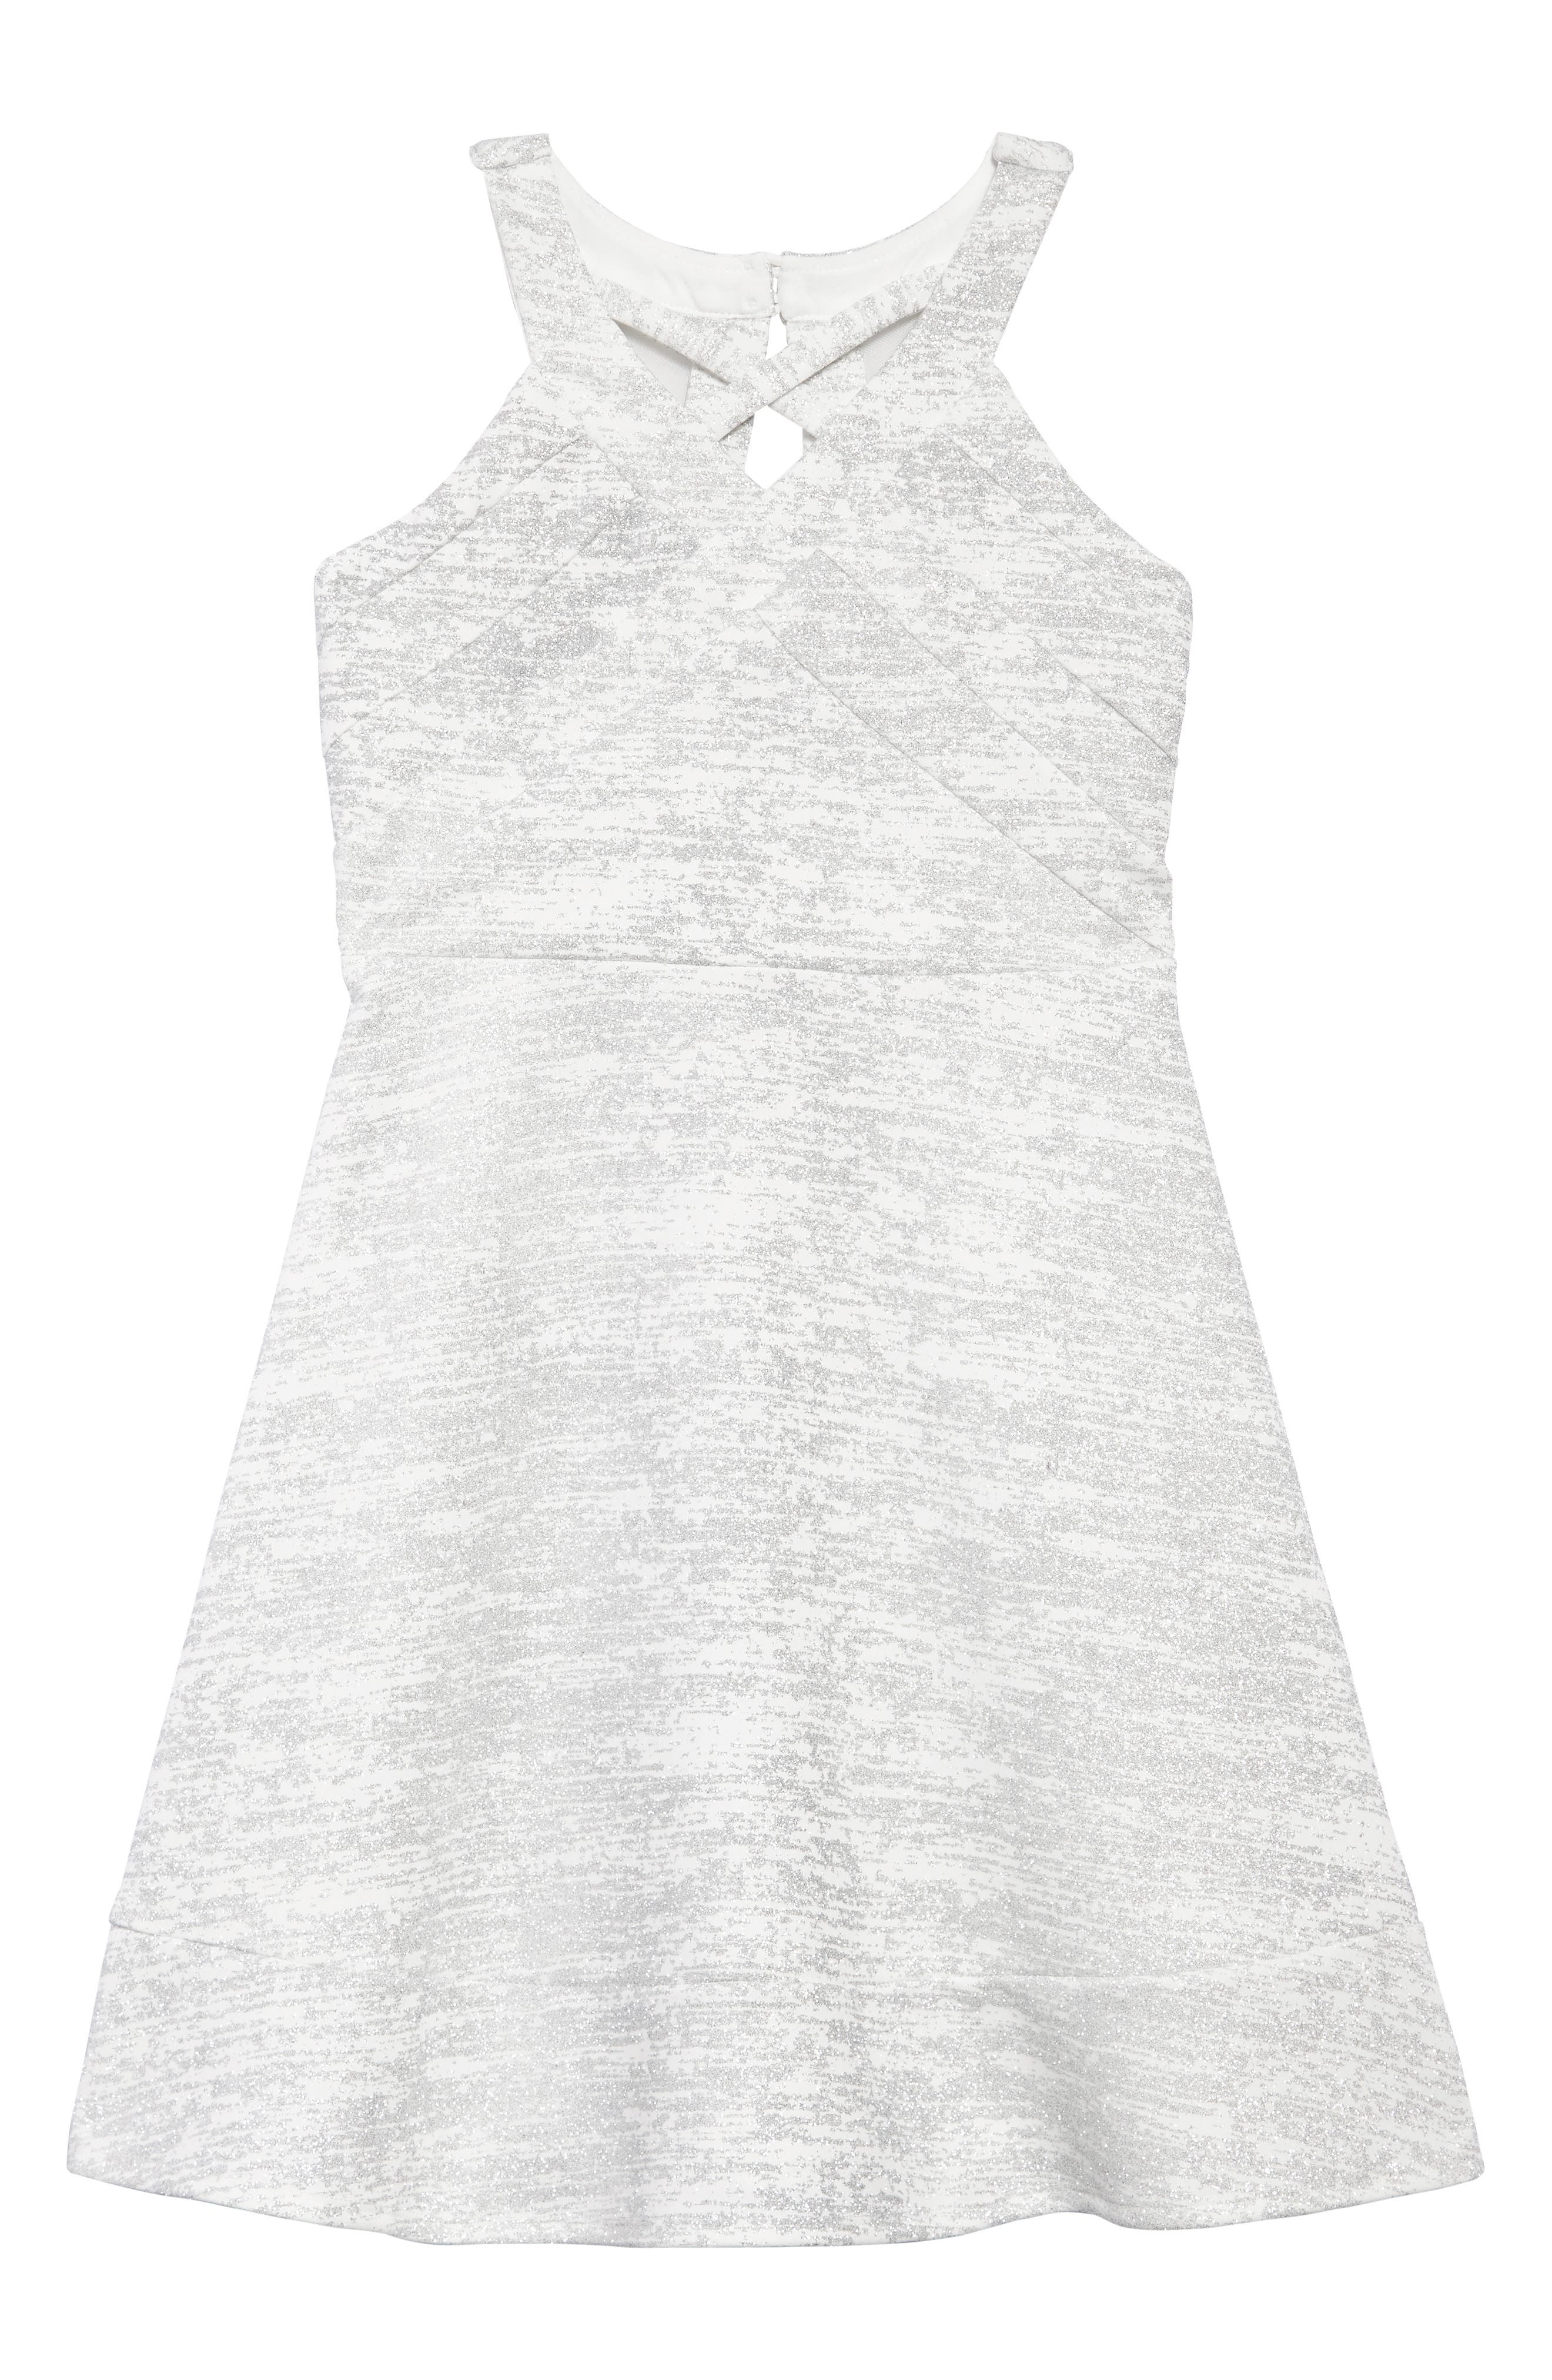 Glitter Scuba Skater Dress,                             Main thumbnail 1, color,                             Ivory/ Silver